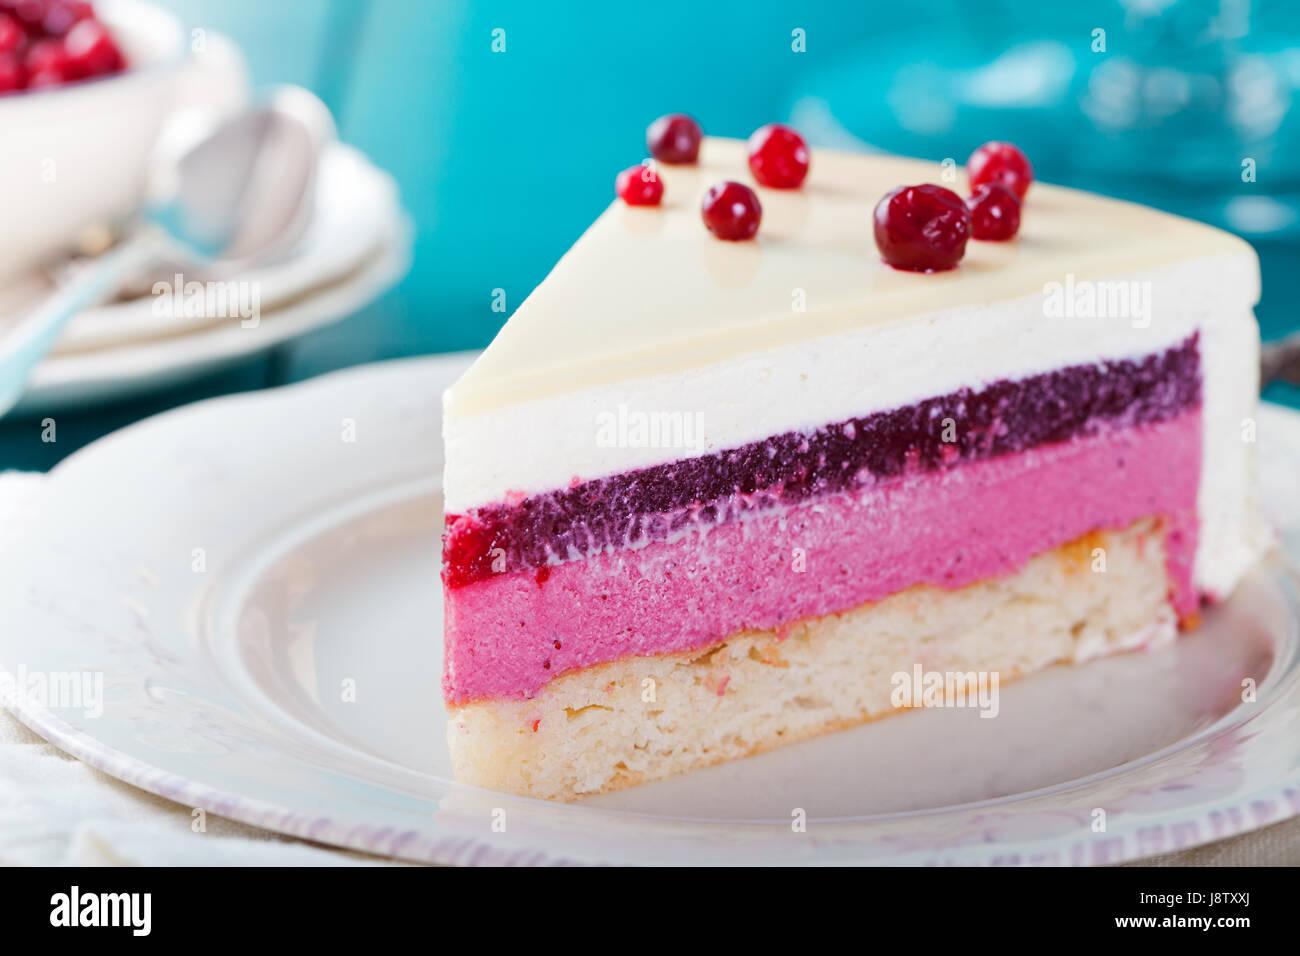 Cranberry, bilberry, raspberry tart, mousse cake. - Stock Image